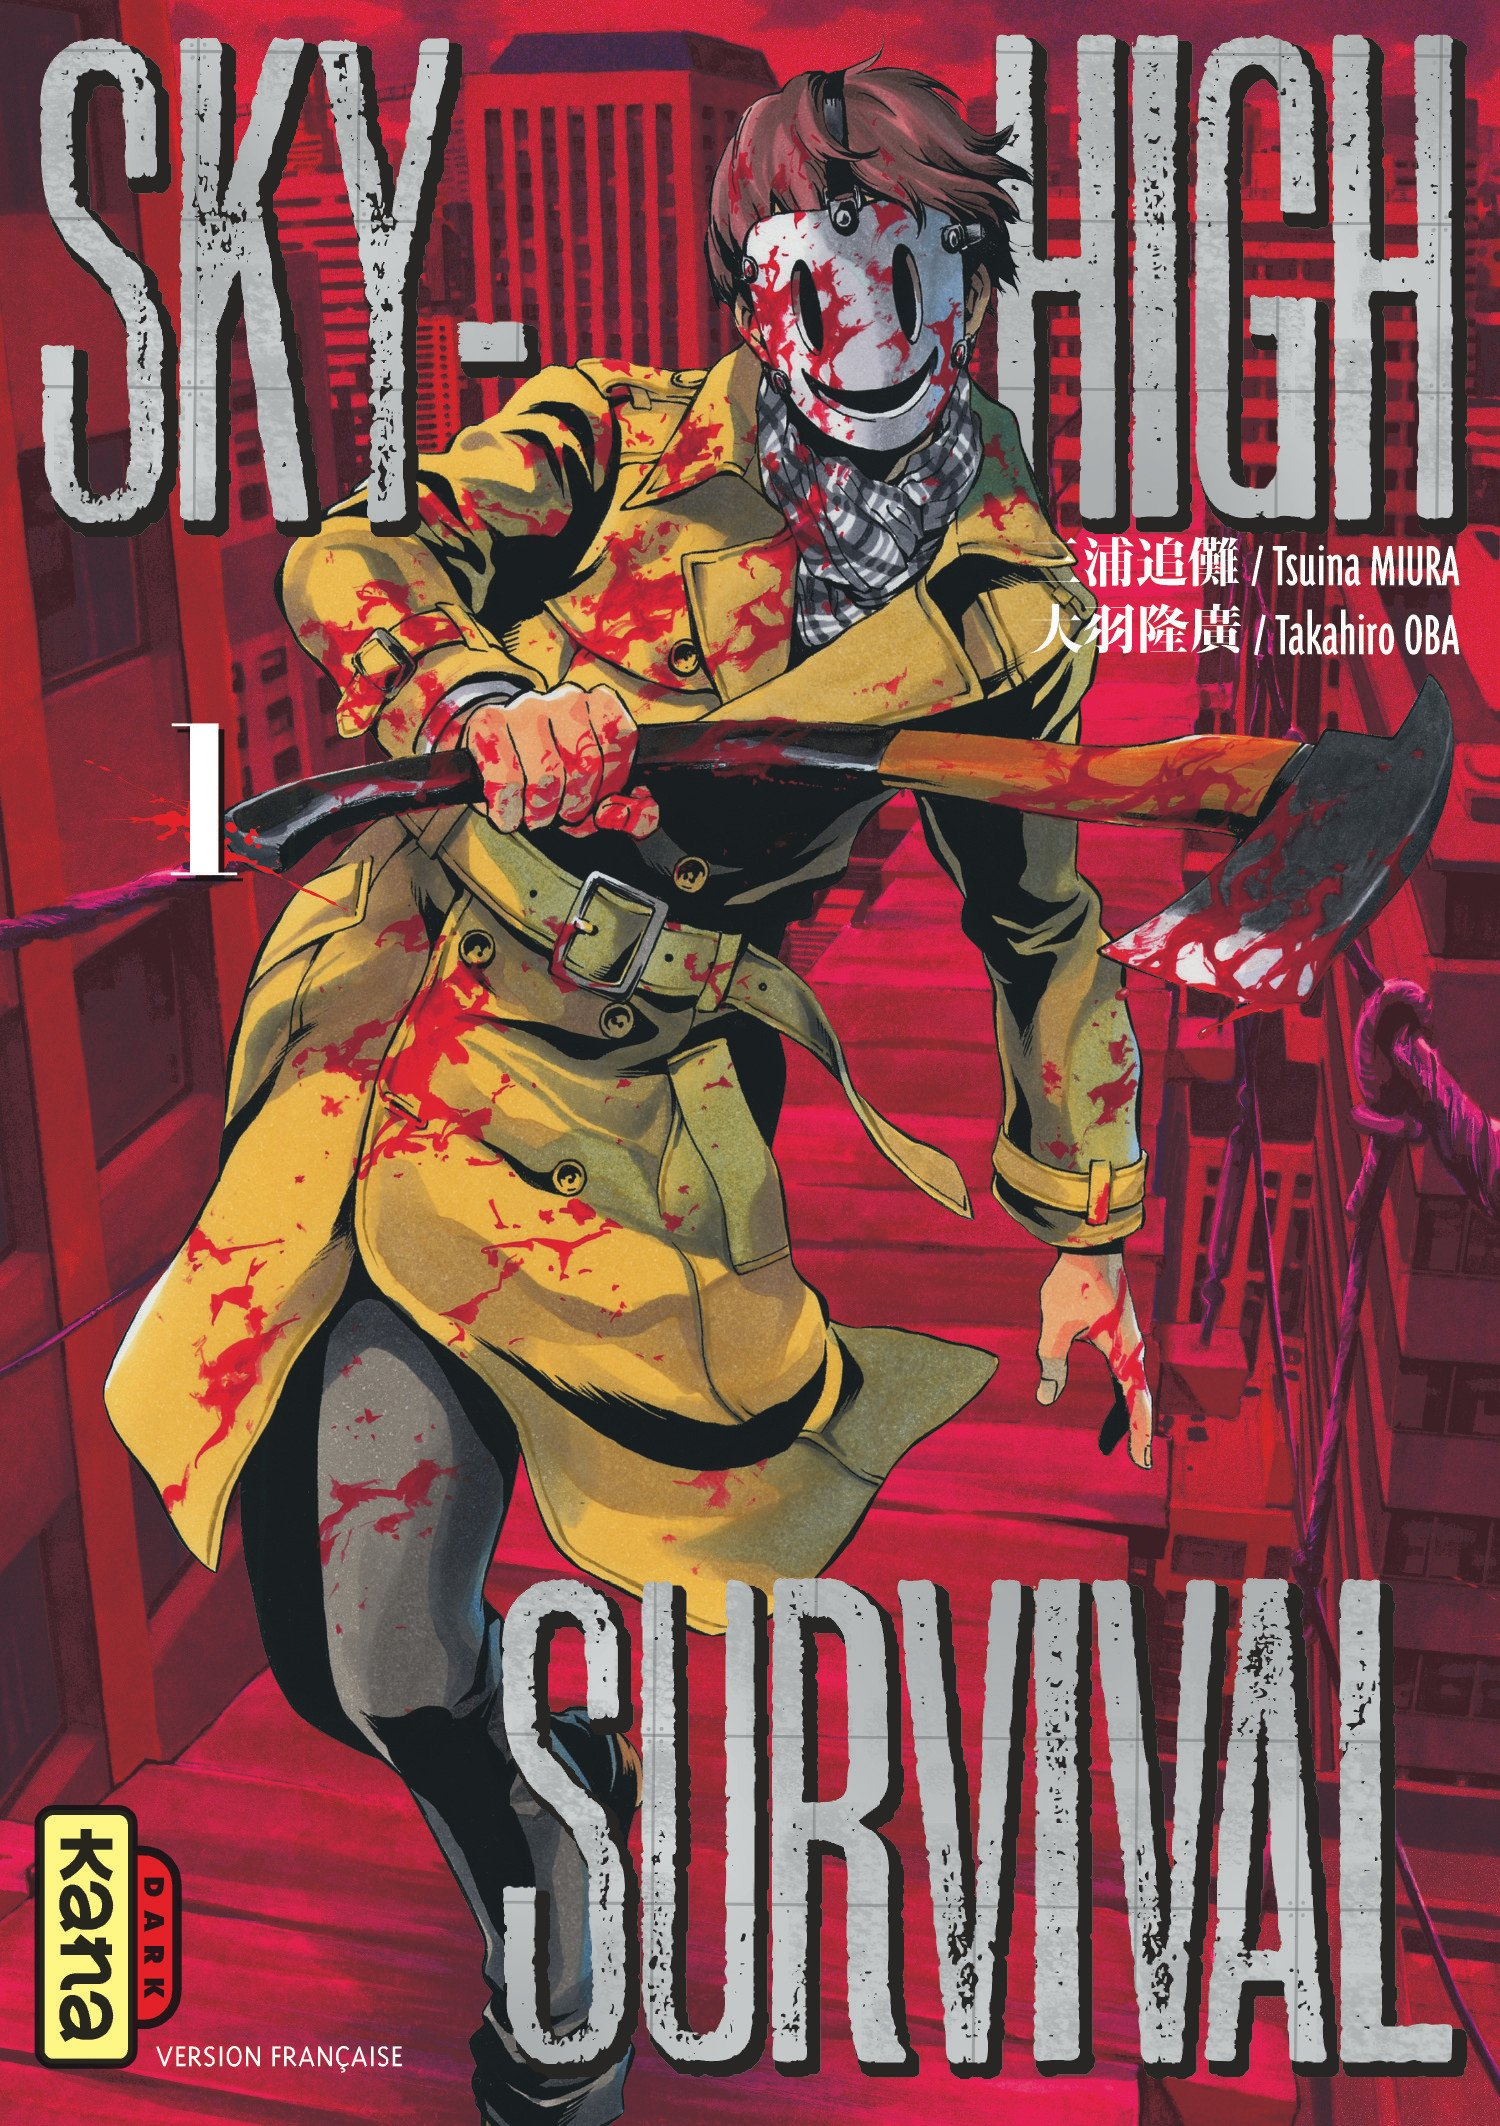 Sky-high Survival T1